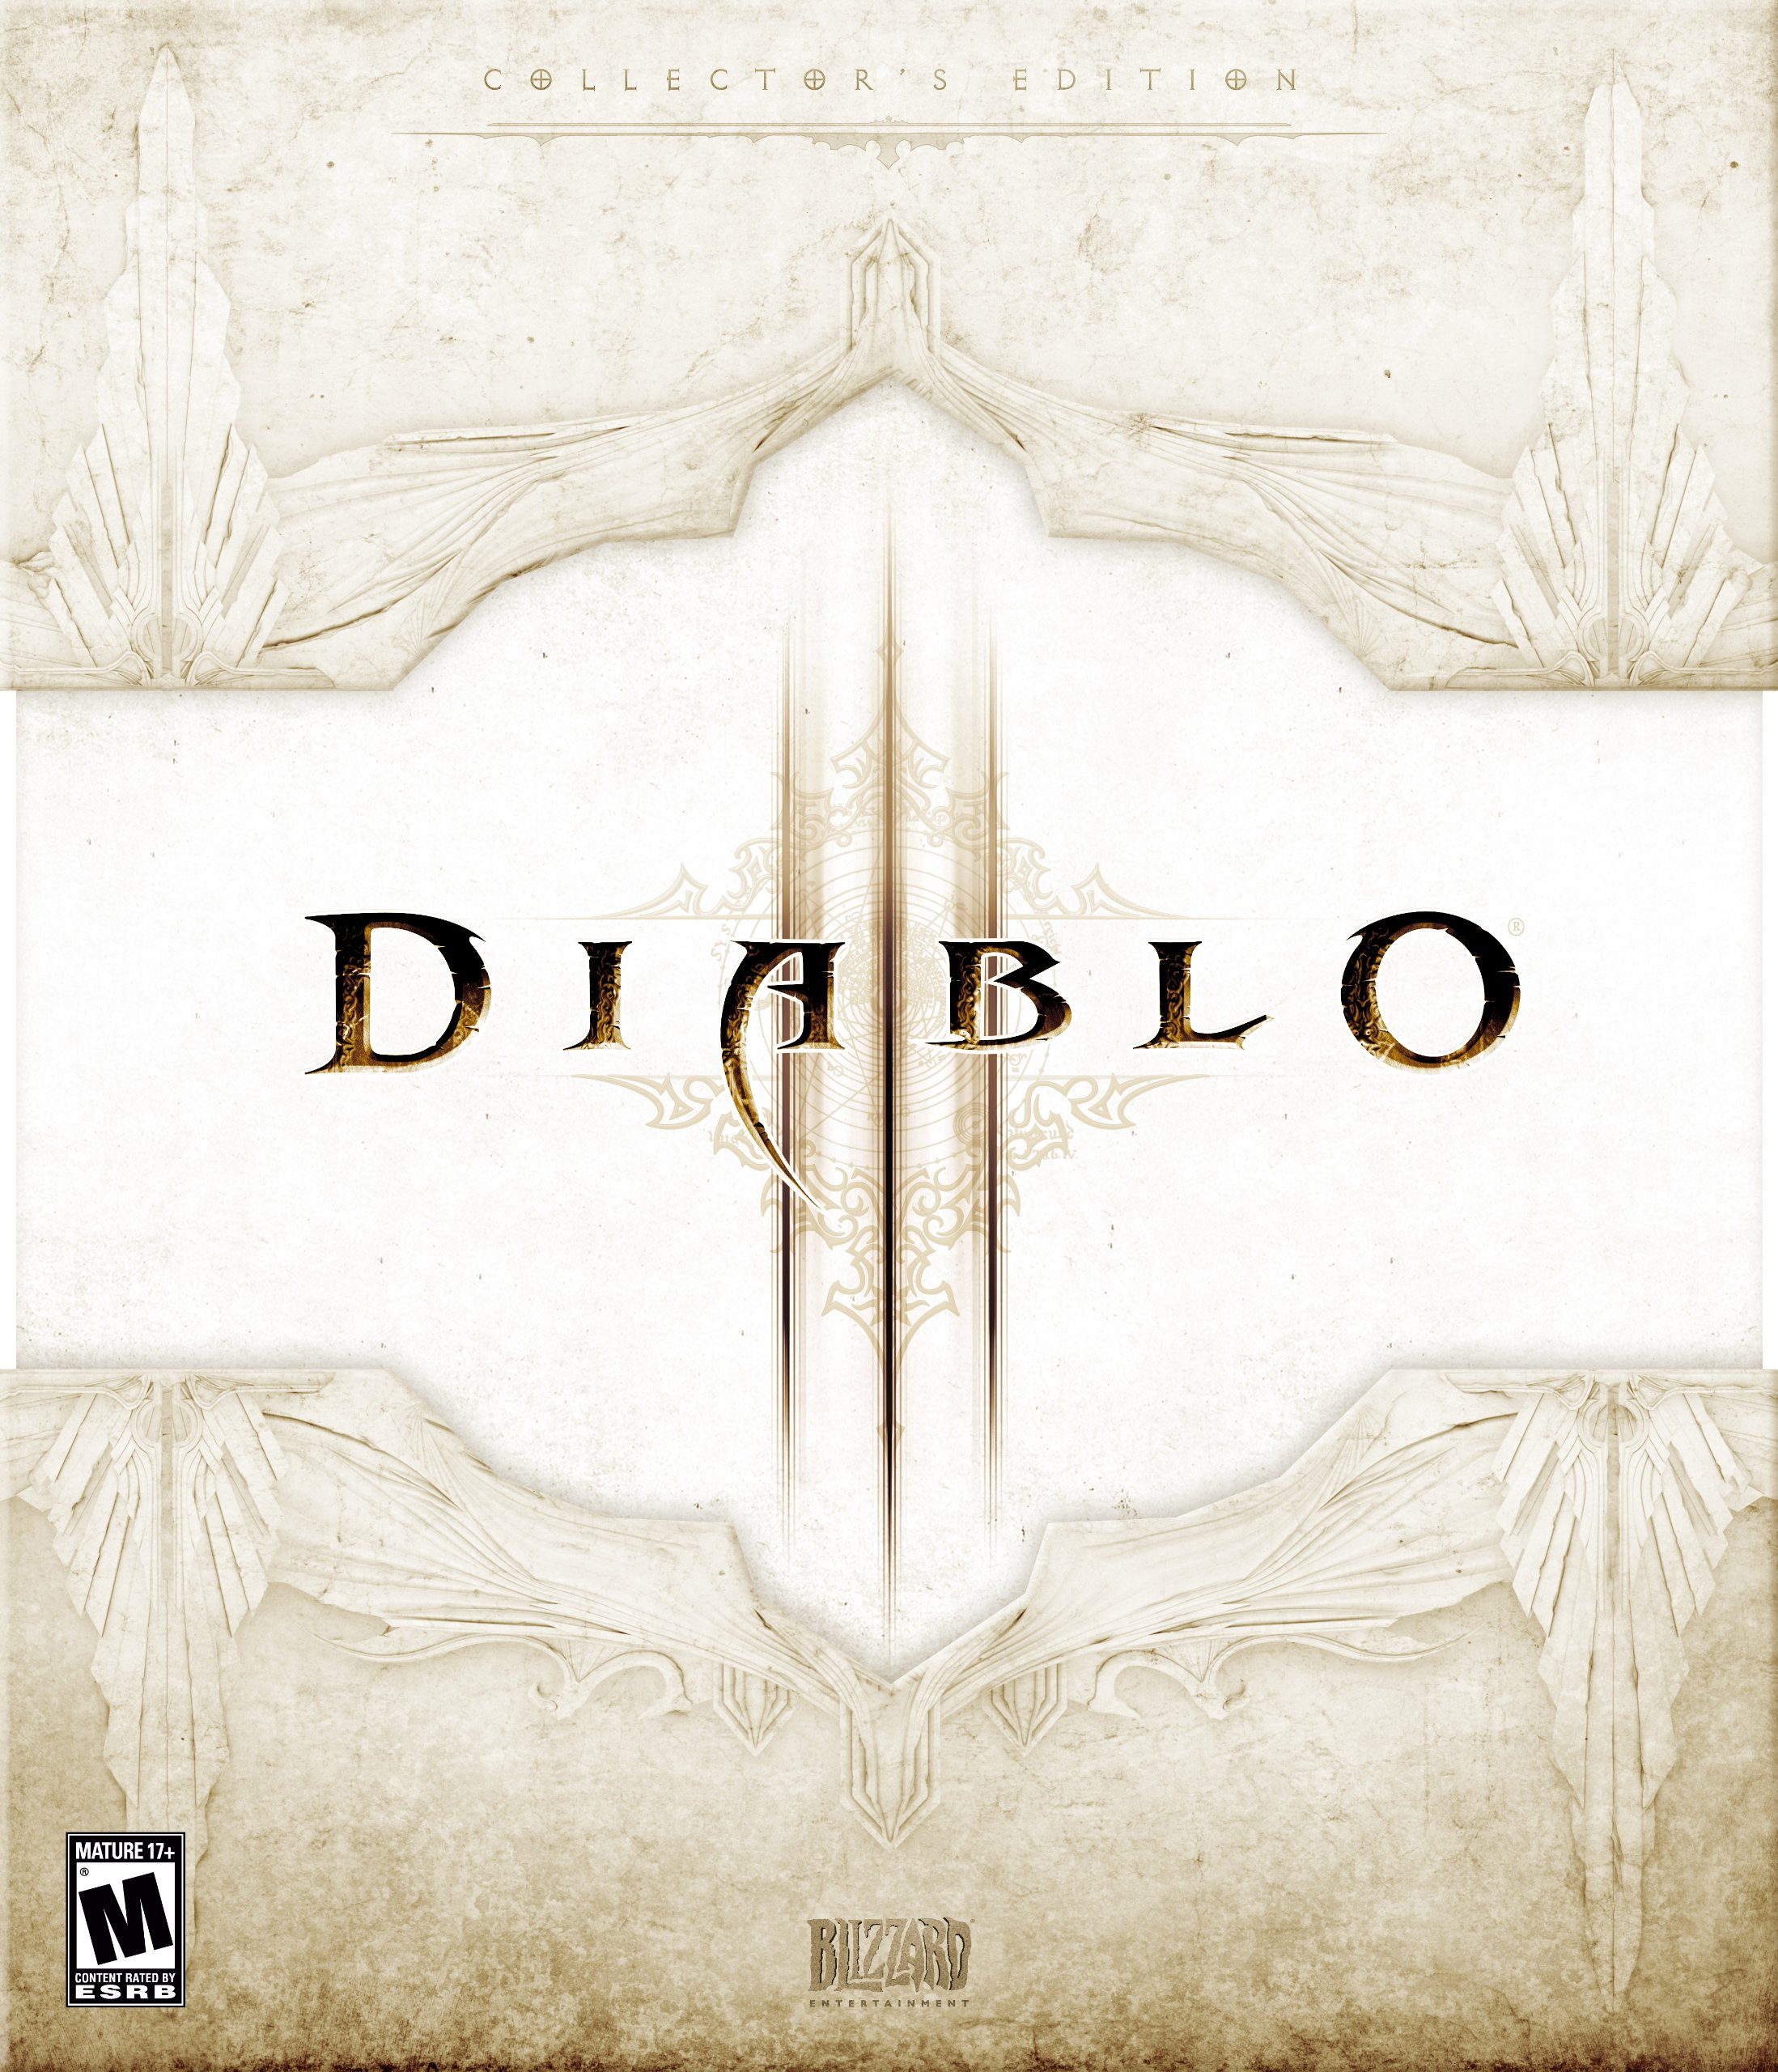 Diablo III: Collector's Edition by Blizzard Entertainment